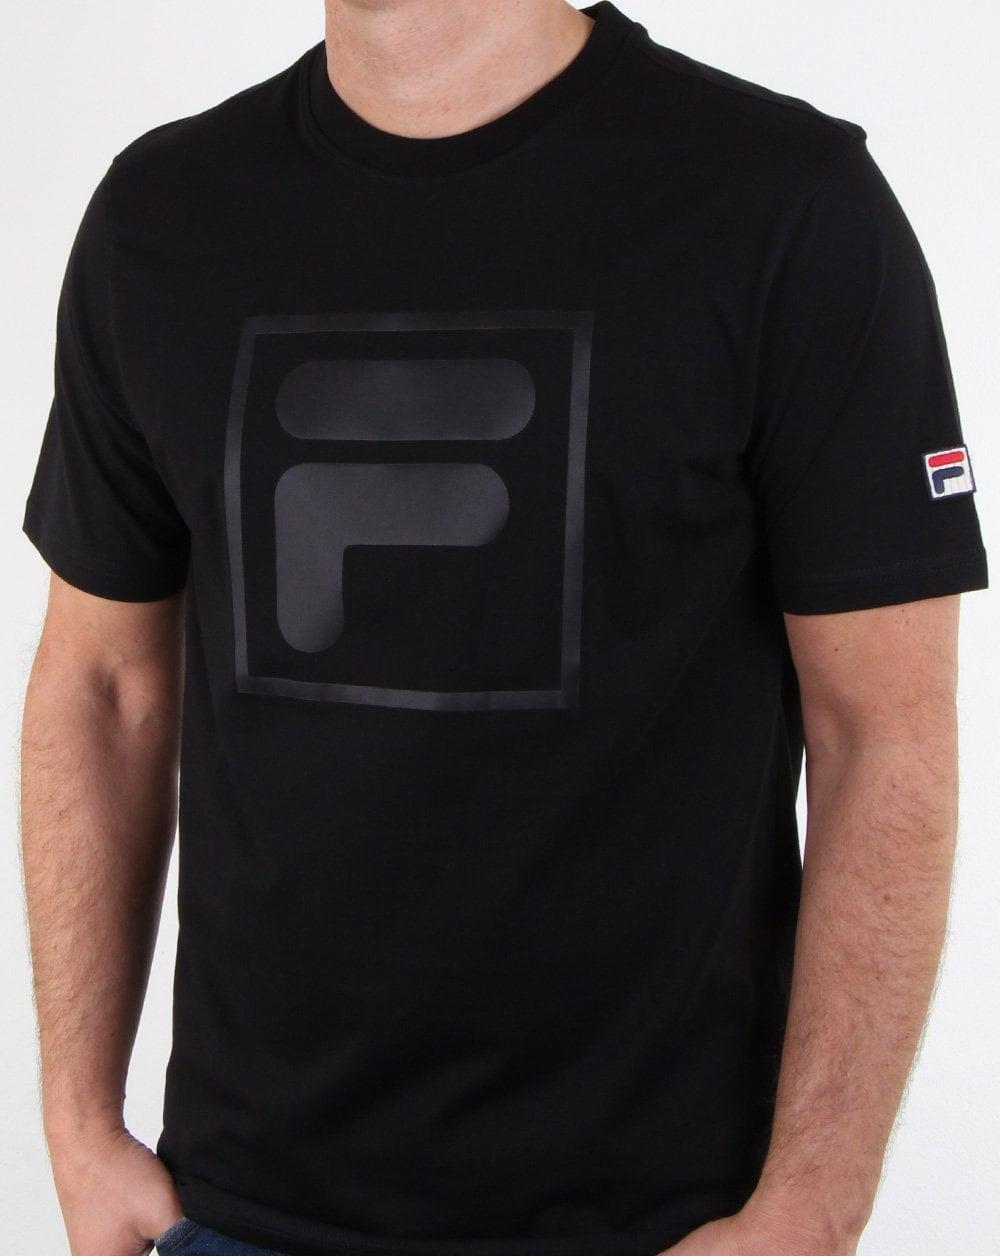 Fila Vintage, Alexis F Box, T Shirt, Black, Mens, Cotton, Crew